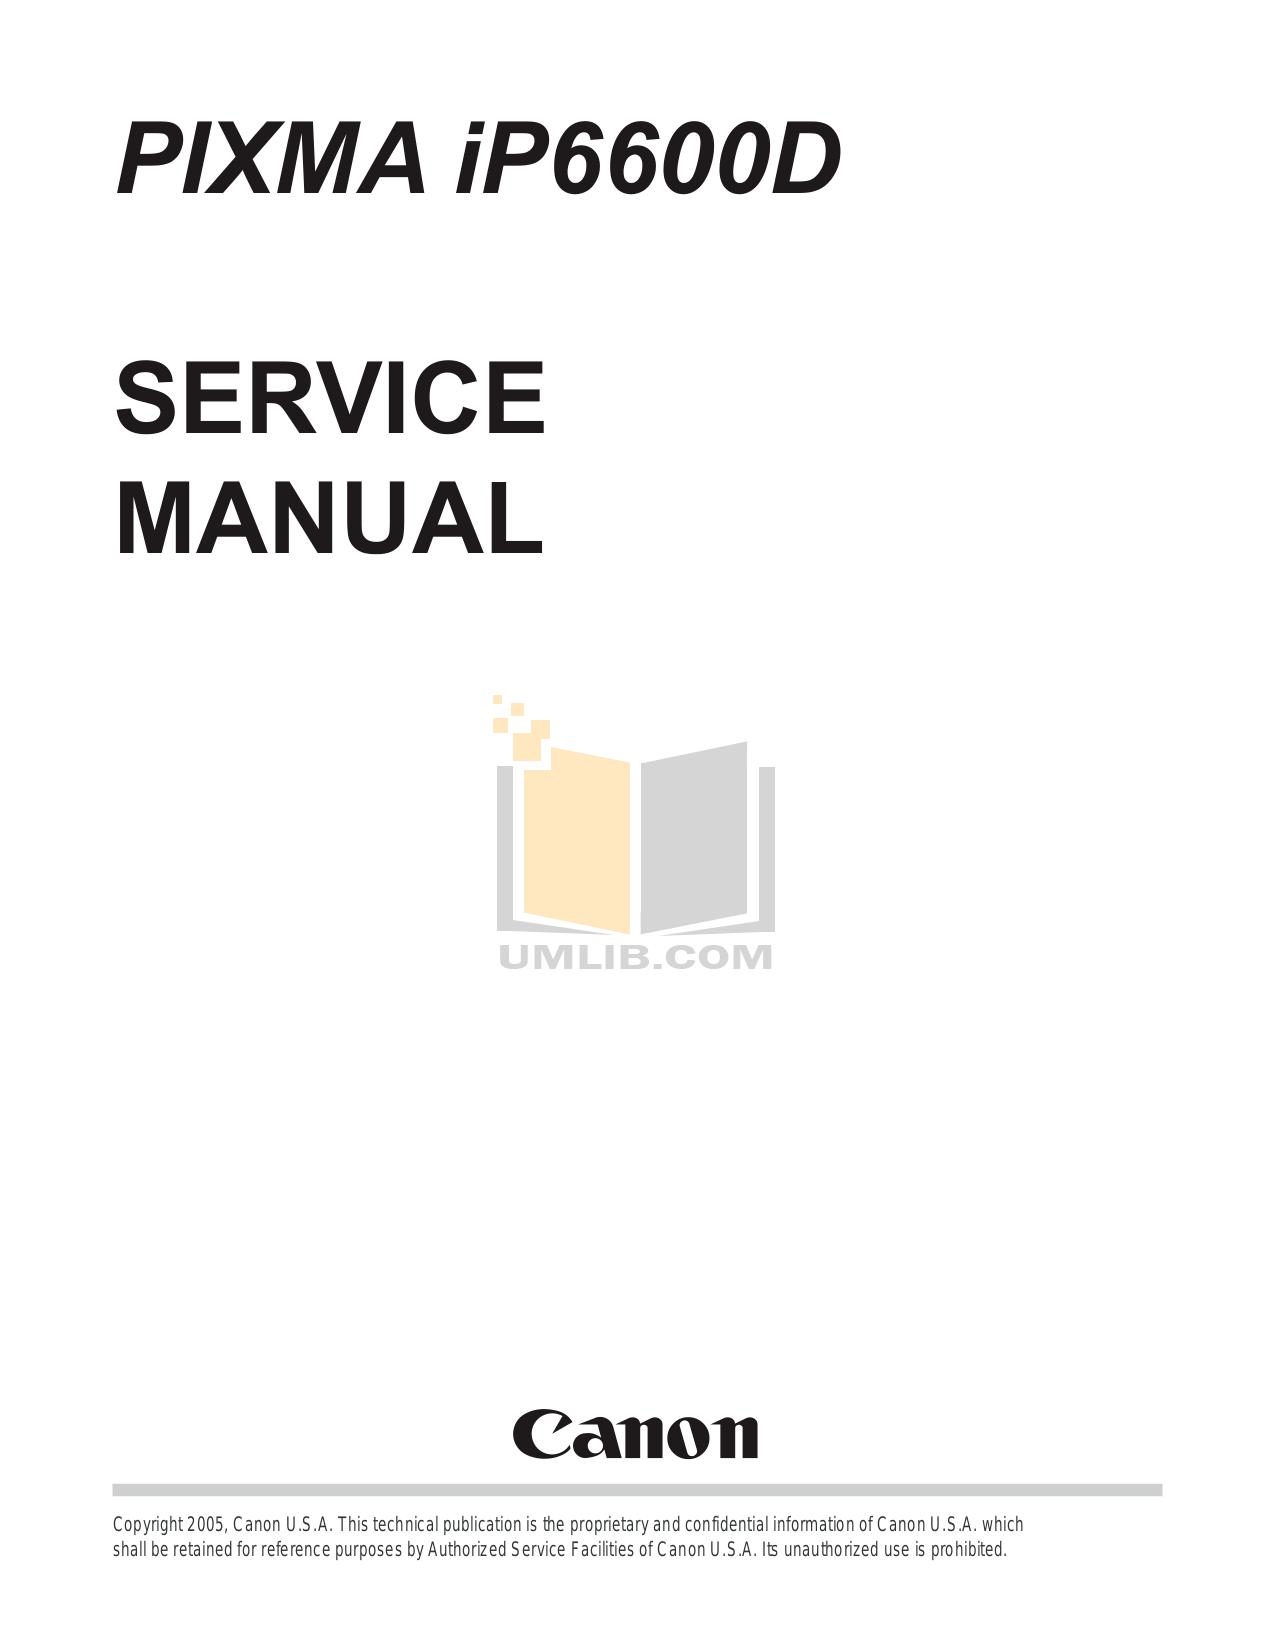 Download free pdf for Canon PIXMA iP6600D Printer manual